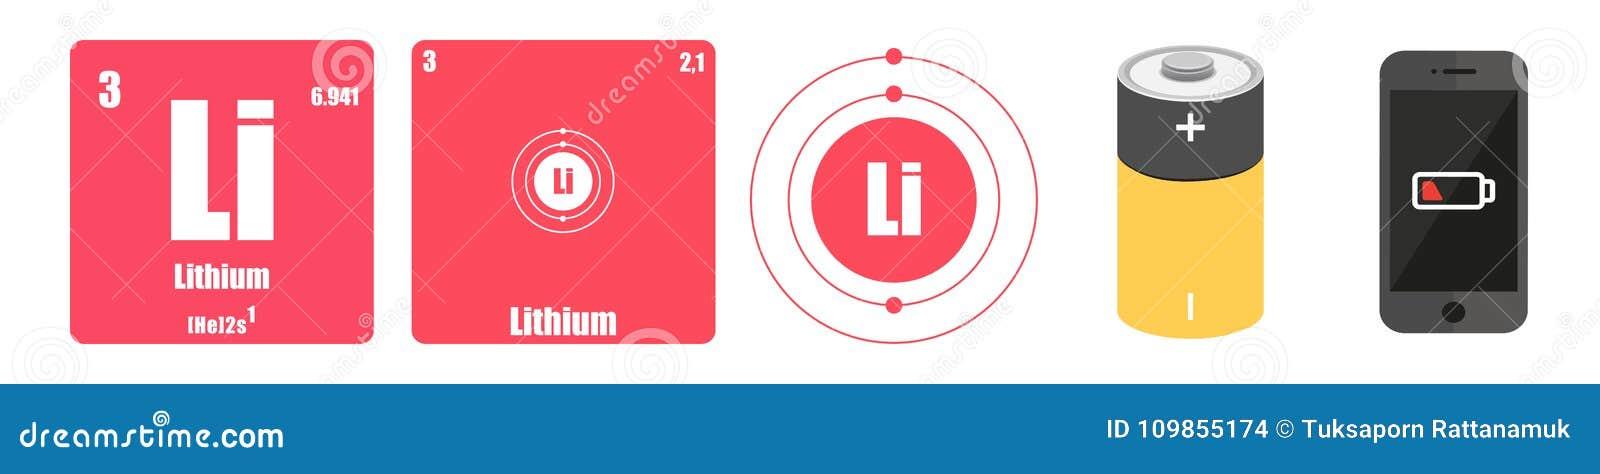 La tabla peridica de grupo del elemento i el lcali metals el litio download la tabla peridica de grupo del elemento i el lcali metals el litio li stock urtaz Choice Image